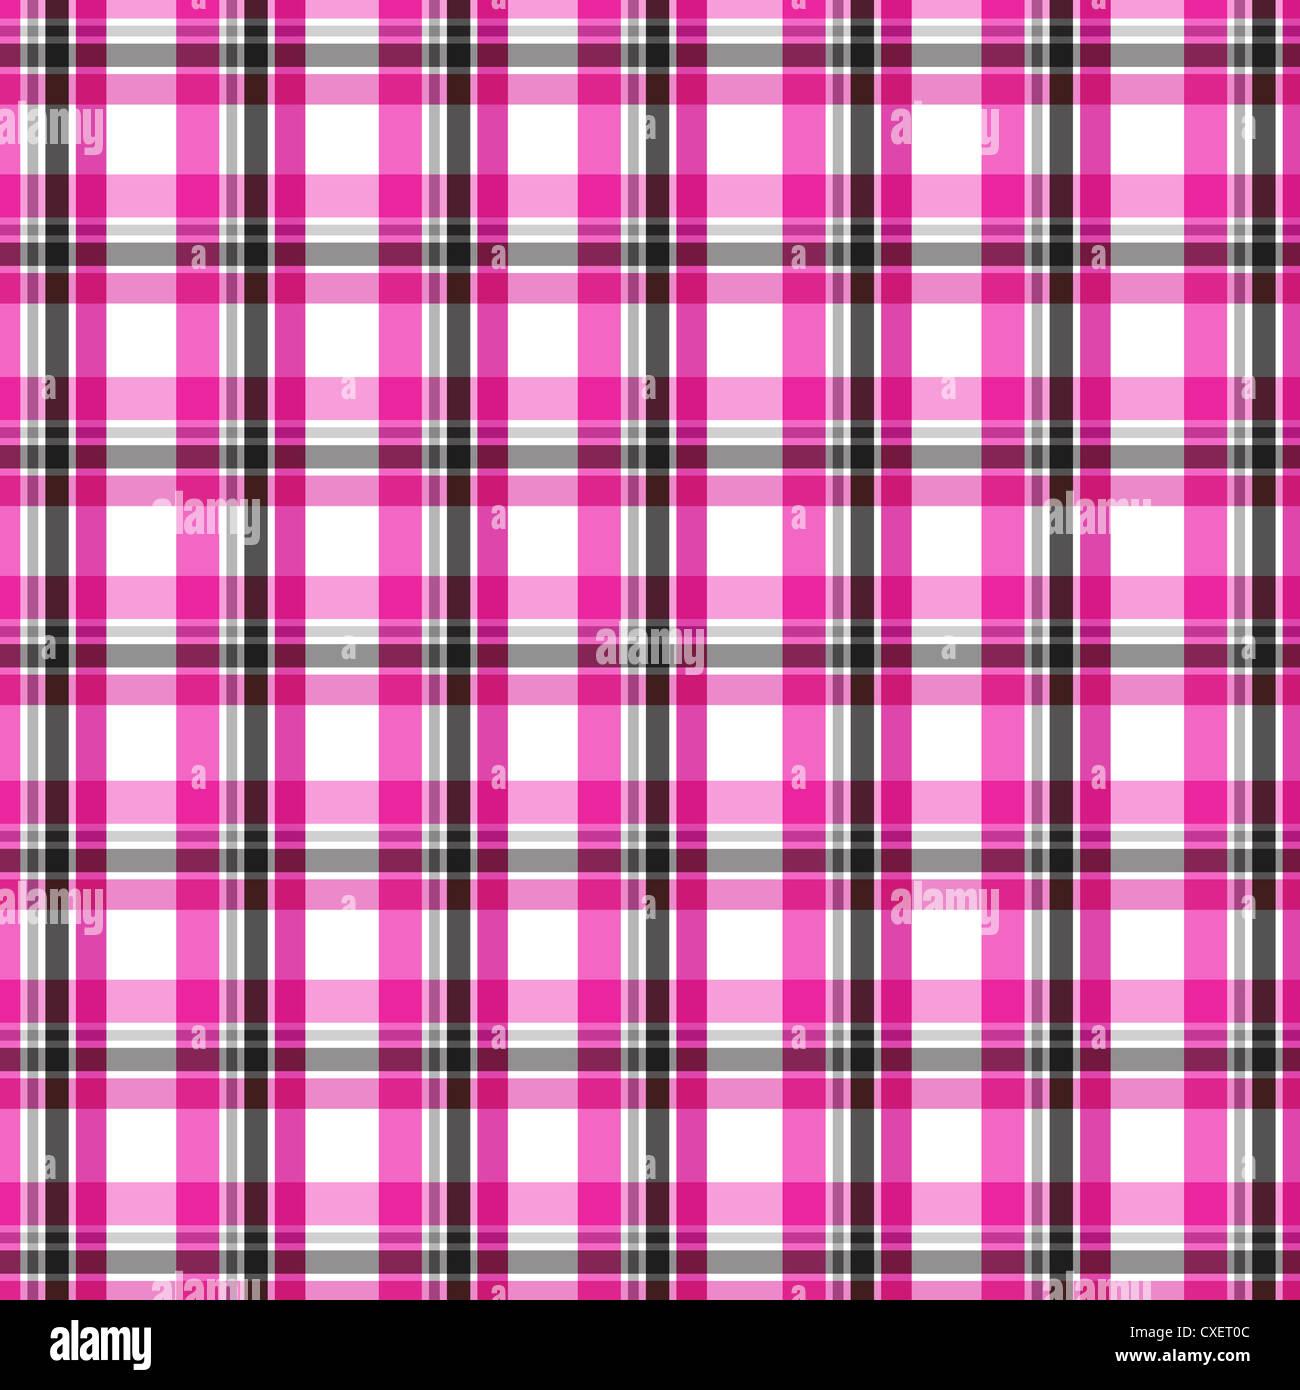 Colorful seamless plaid pattern Stock Photo